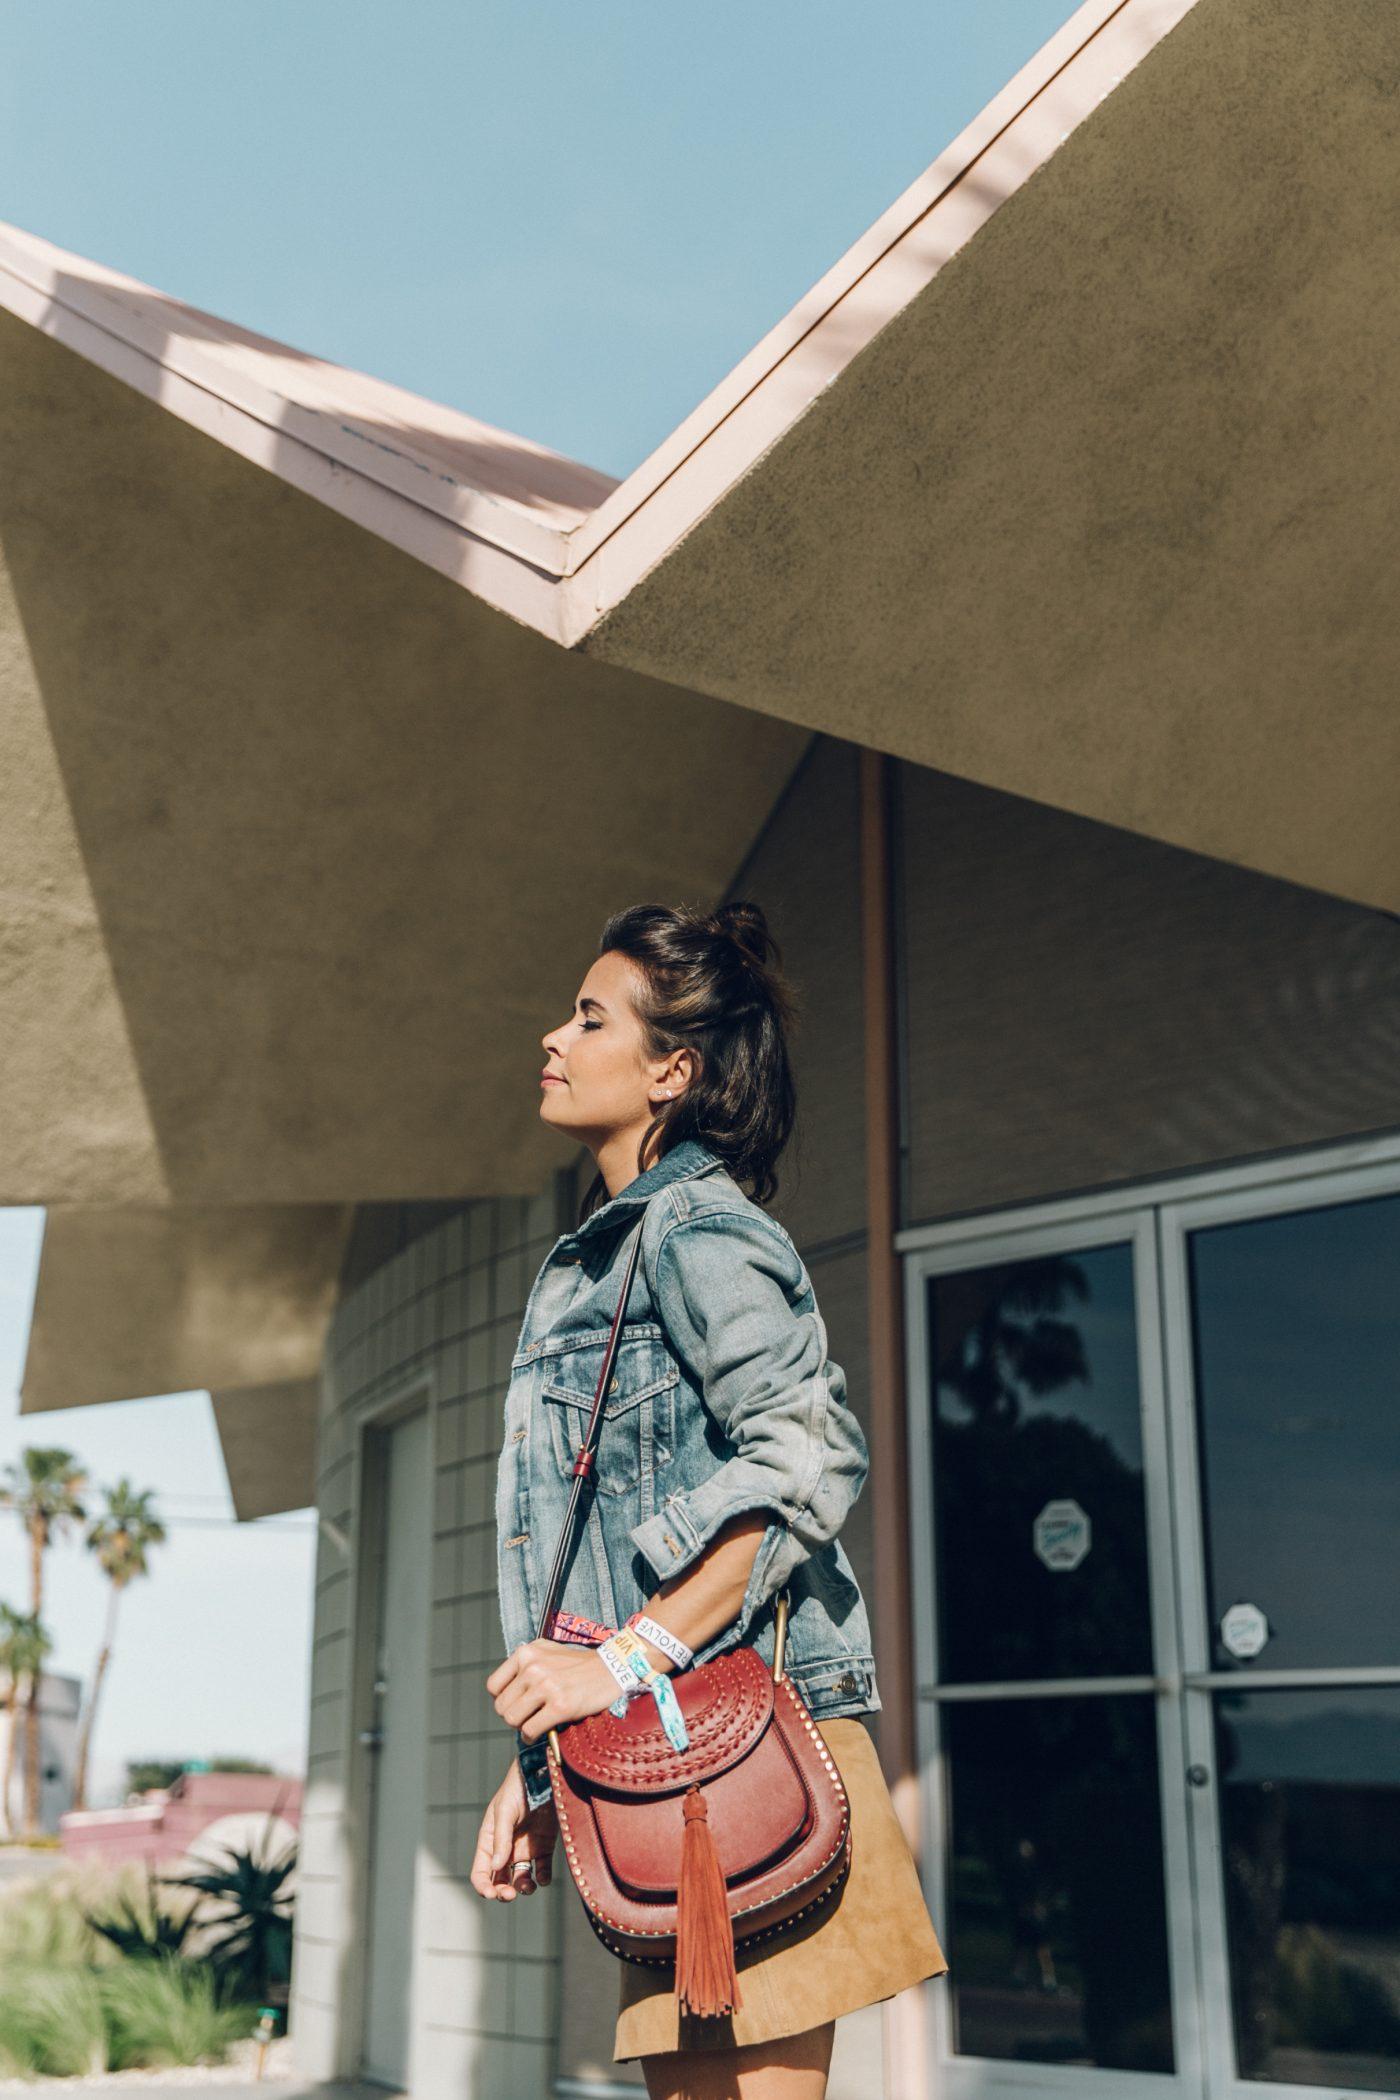 Denim_Jacket-Saint_Laurent-Chloe_Top-Suede_Skirt-Chloe_Hudson_Bag-Espadrilles-Coachella-Palm_Springs-Outfit-Collage_Vintage-11